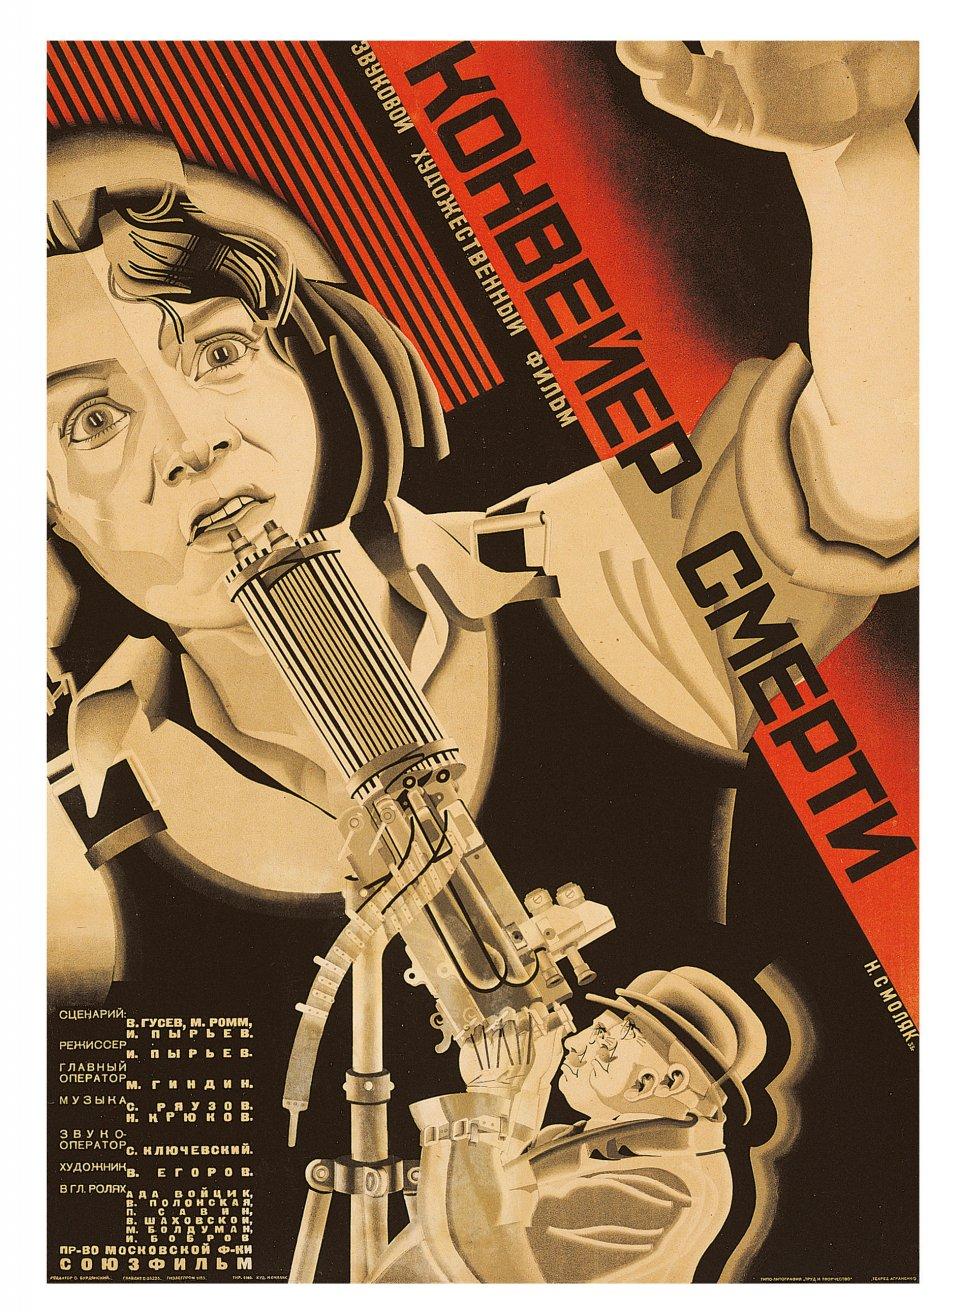 Copyright: © TASCHEN / Susan Pack, California | Seite. 161 | Smolyakovsky, Film poster for Konveier smerti, 1933